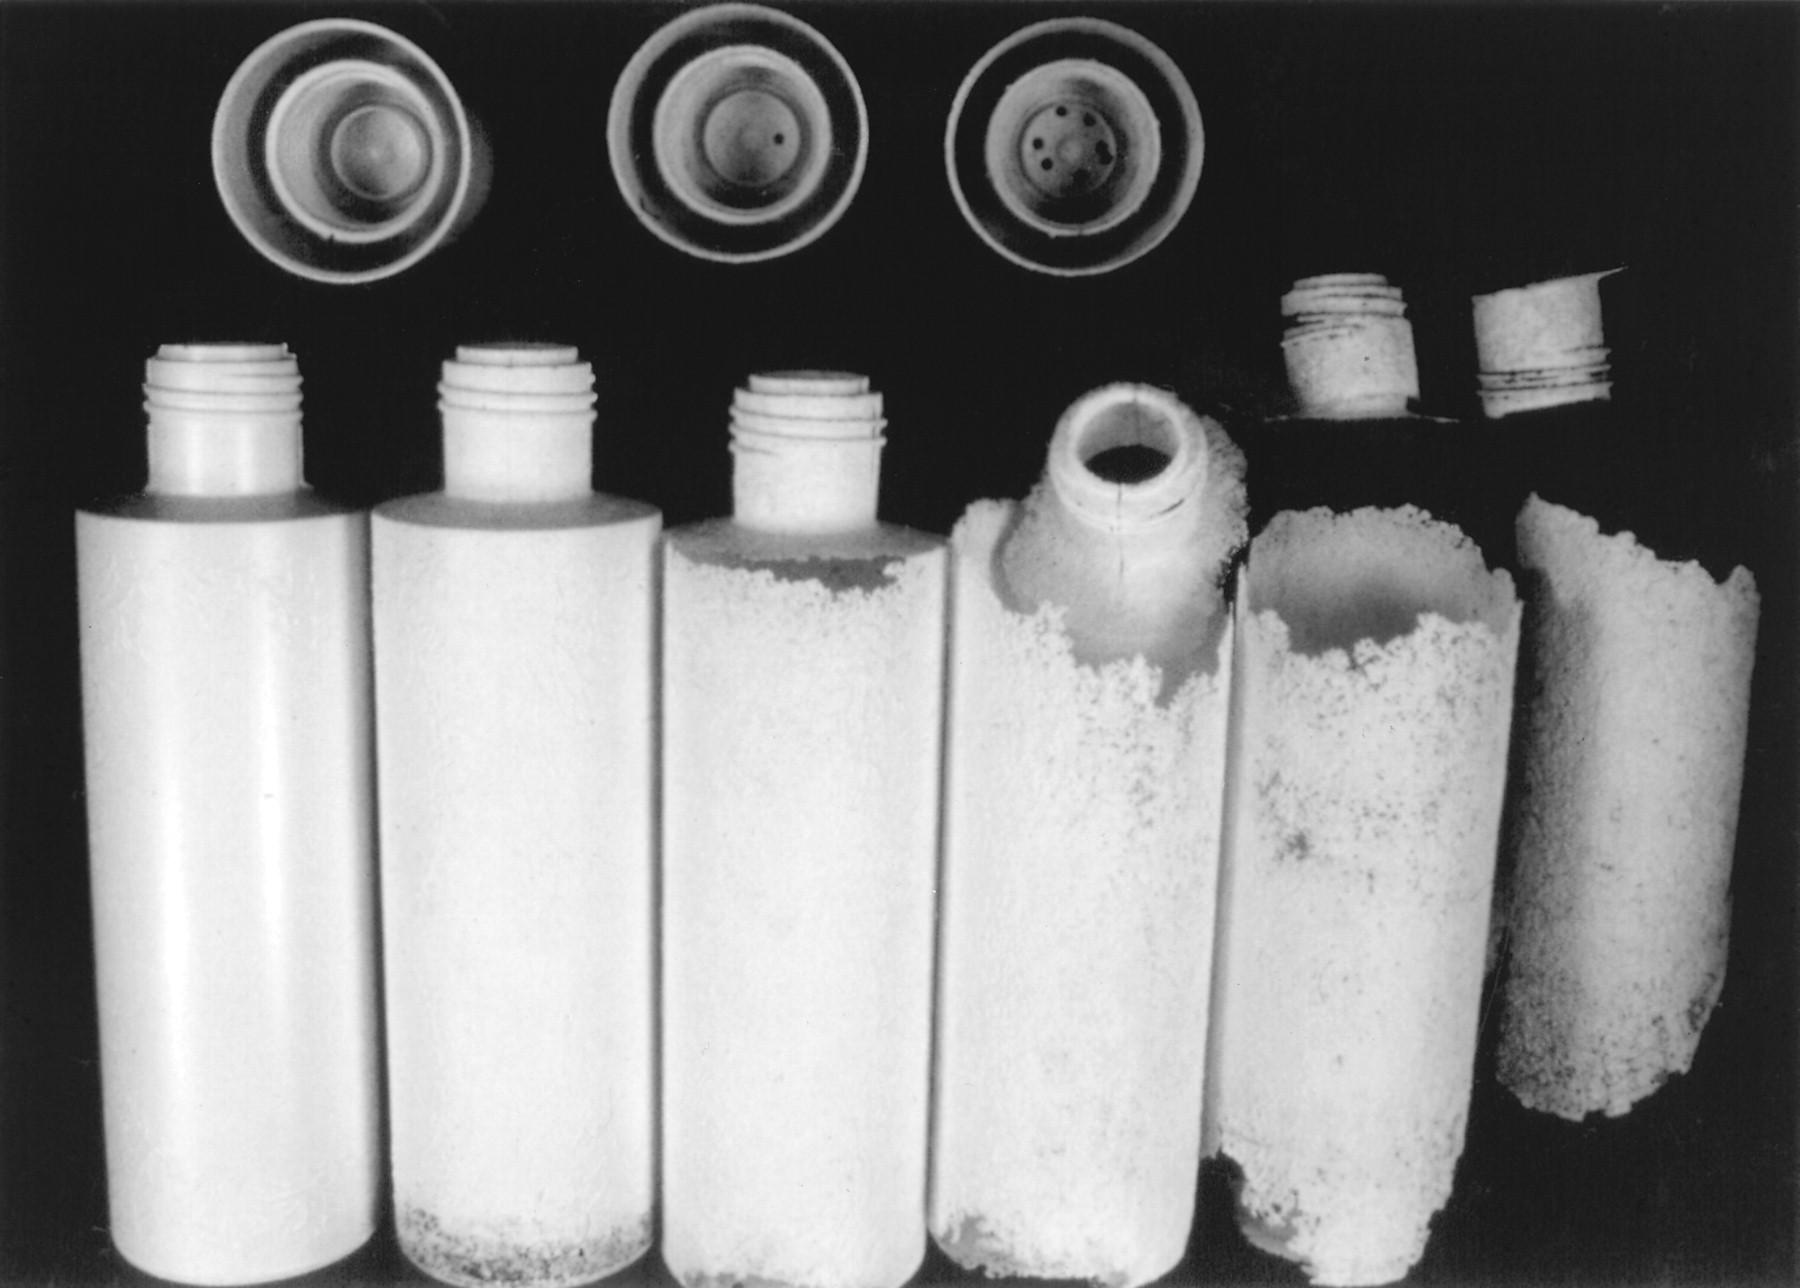 nhựa sinh học phân hủy